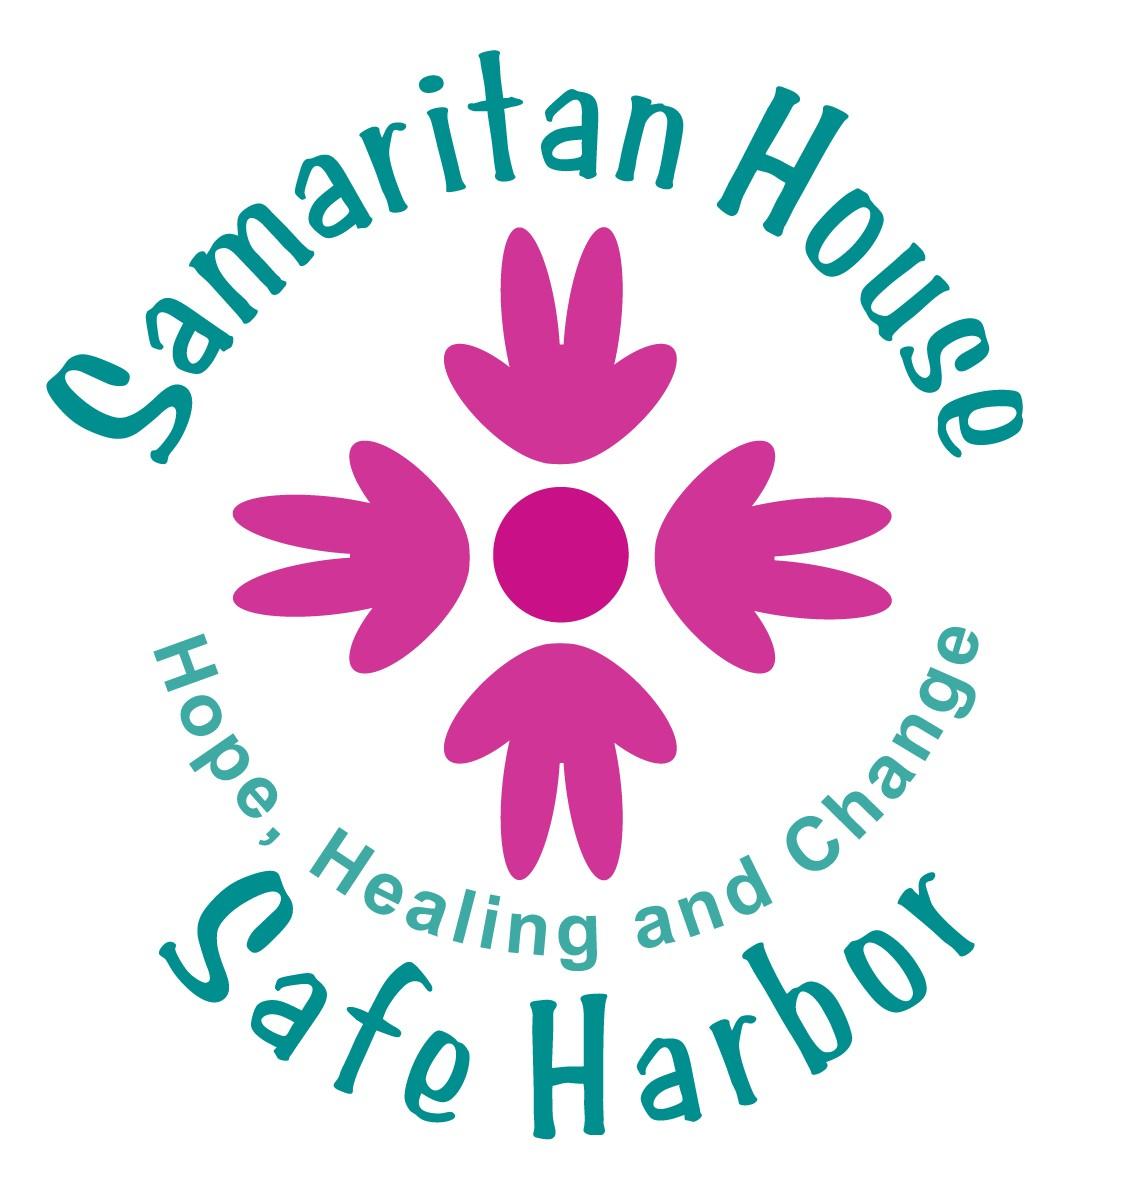 Samaritan House Virginia Beach Va